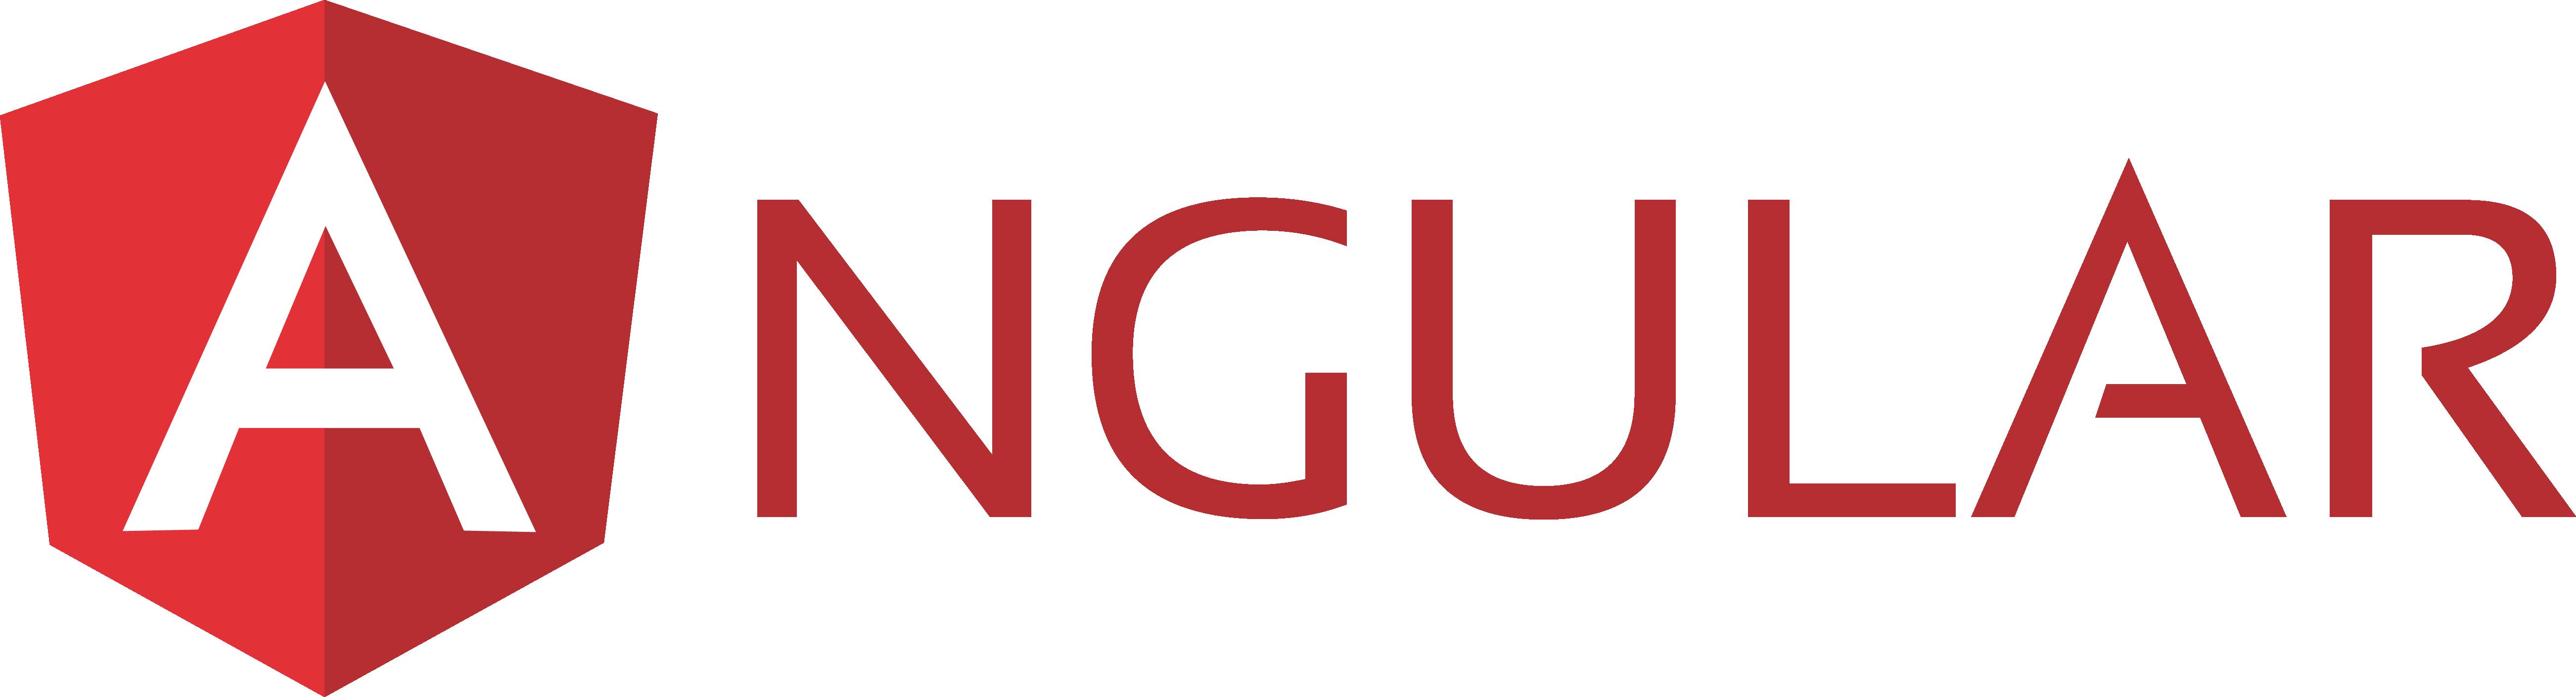 Angular Logo Enterprise application, Data, Angular